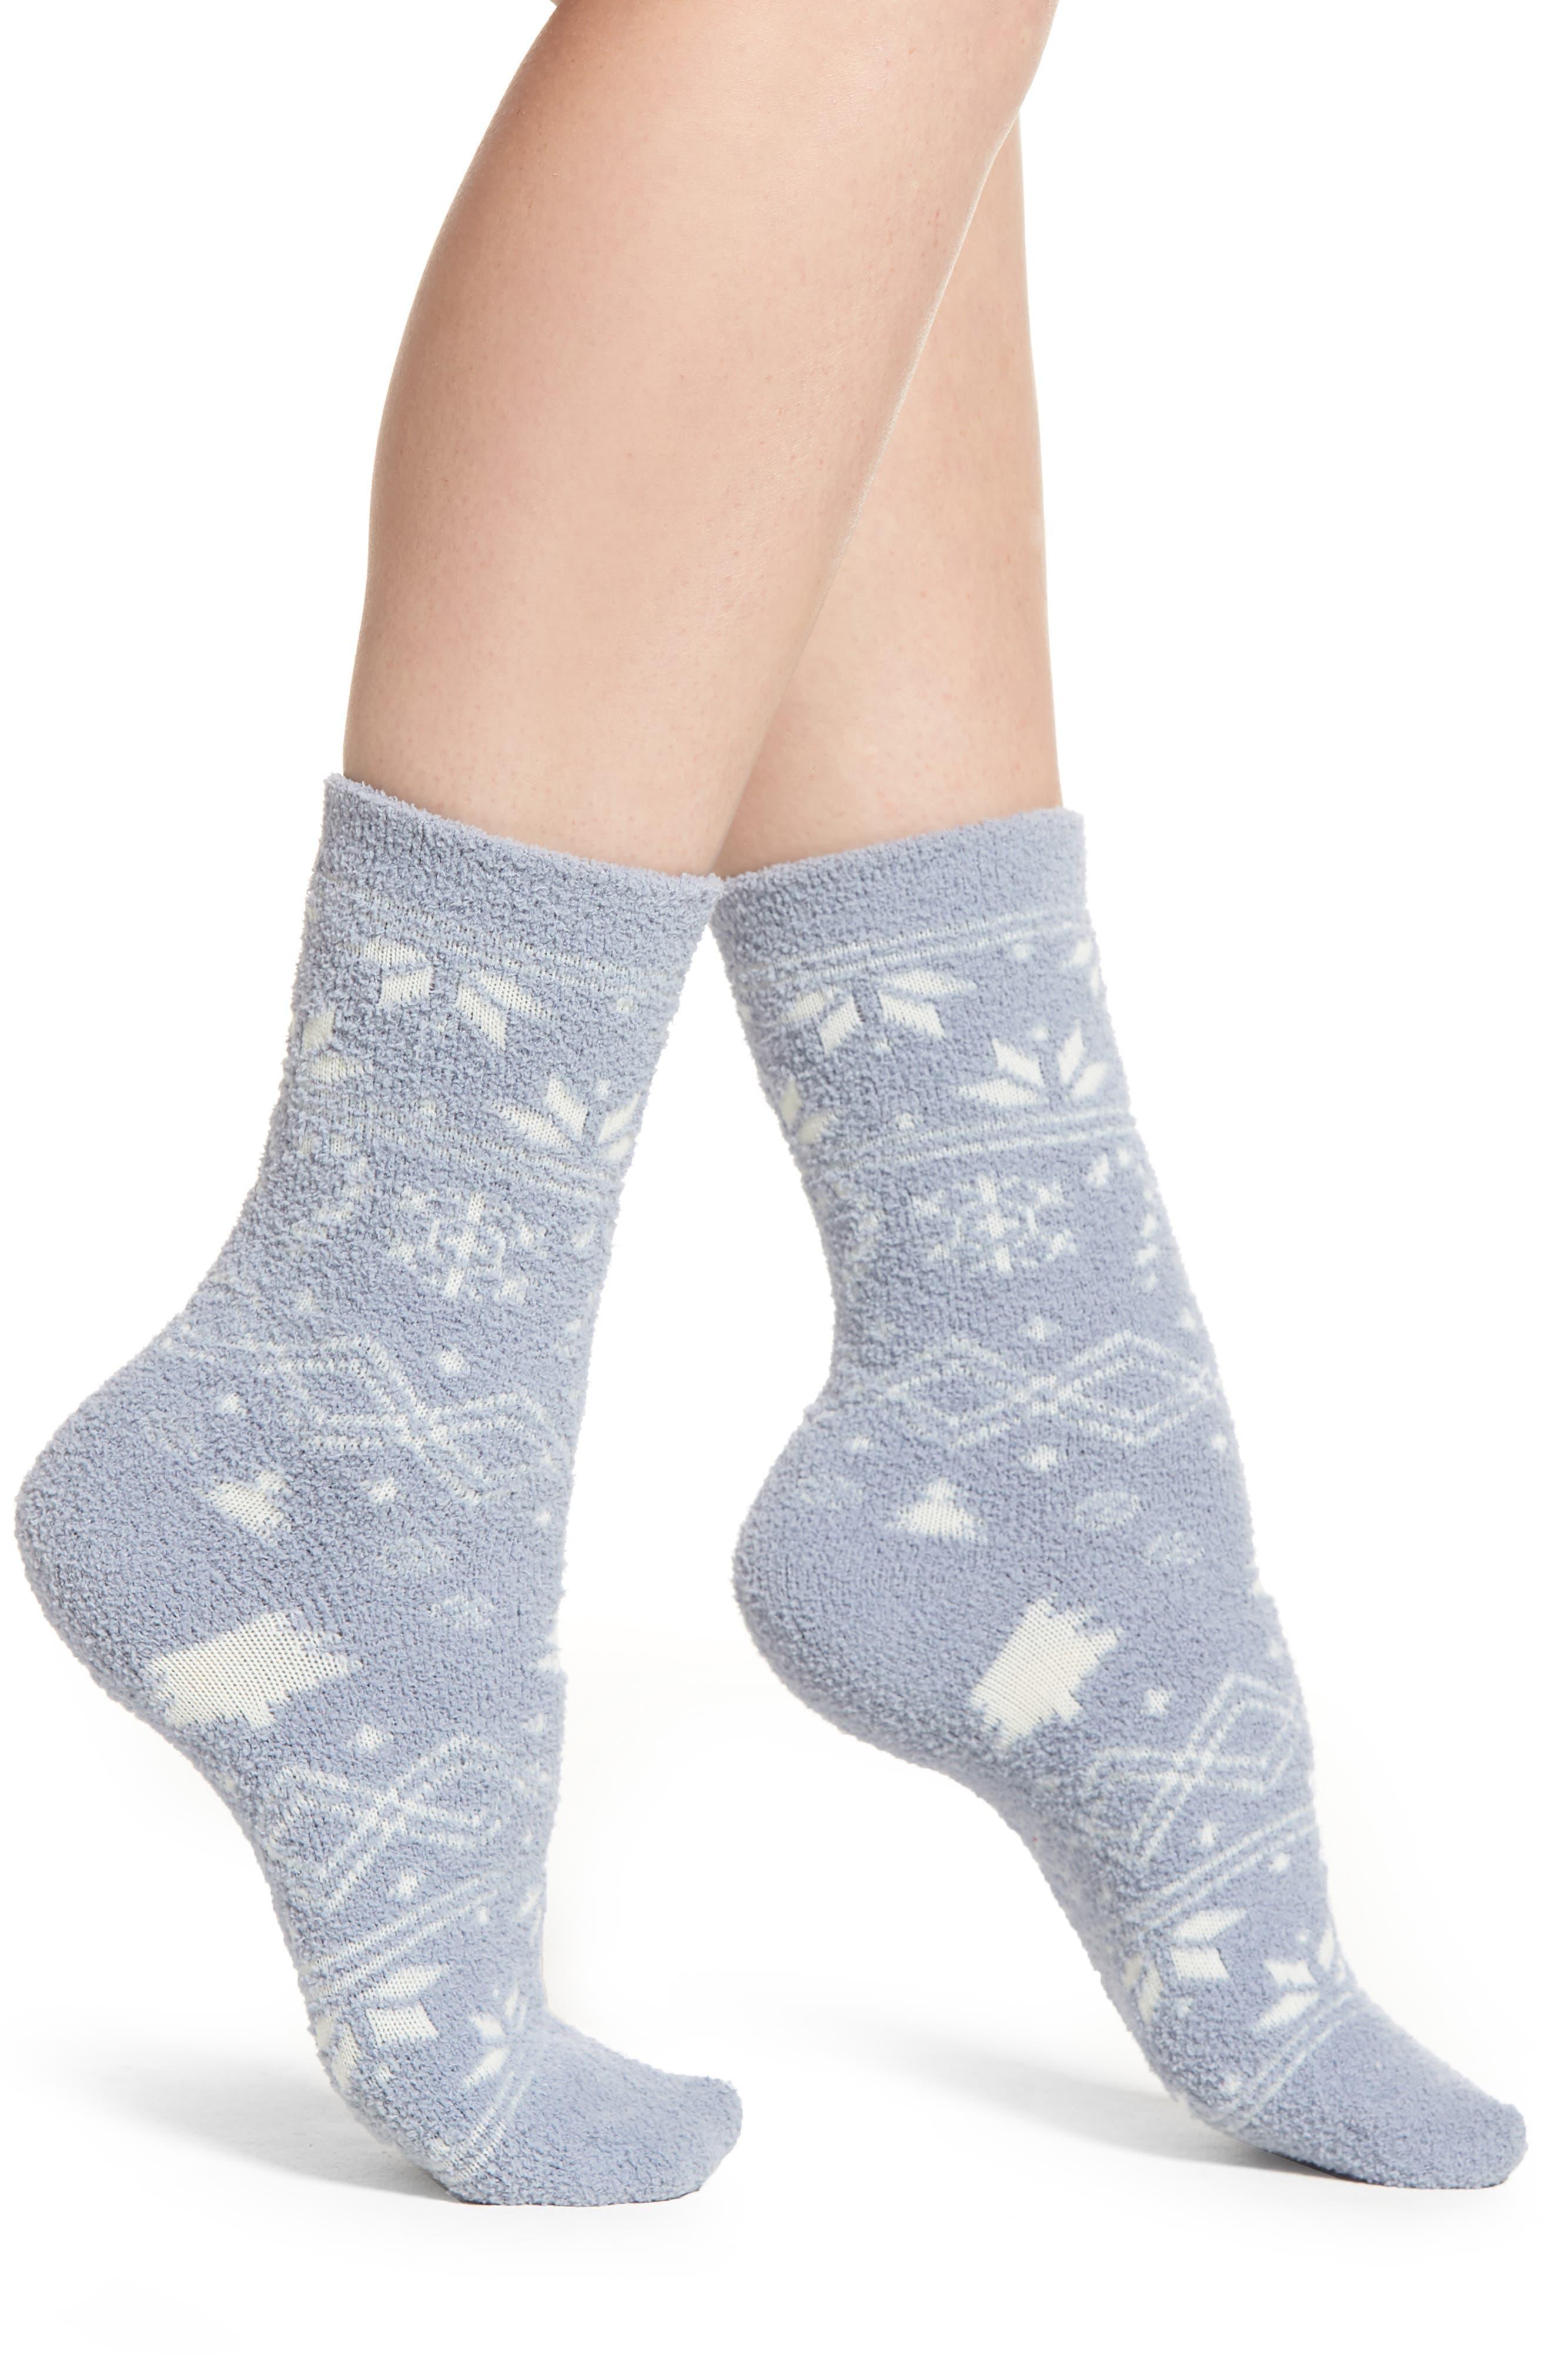 Chamois Crew Socks,                             Main thumbnail 1, color,                             BLUE FAIRISLE